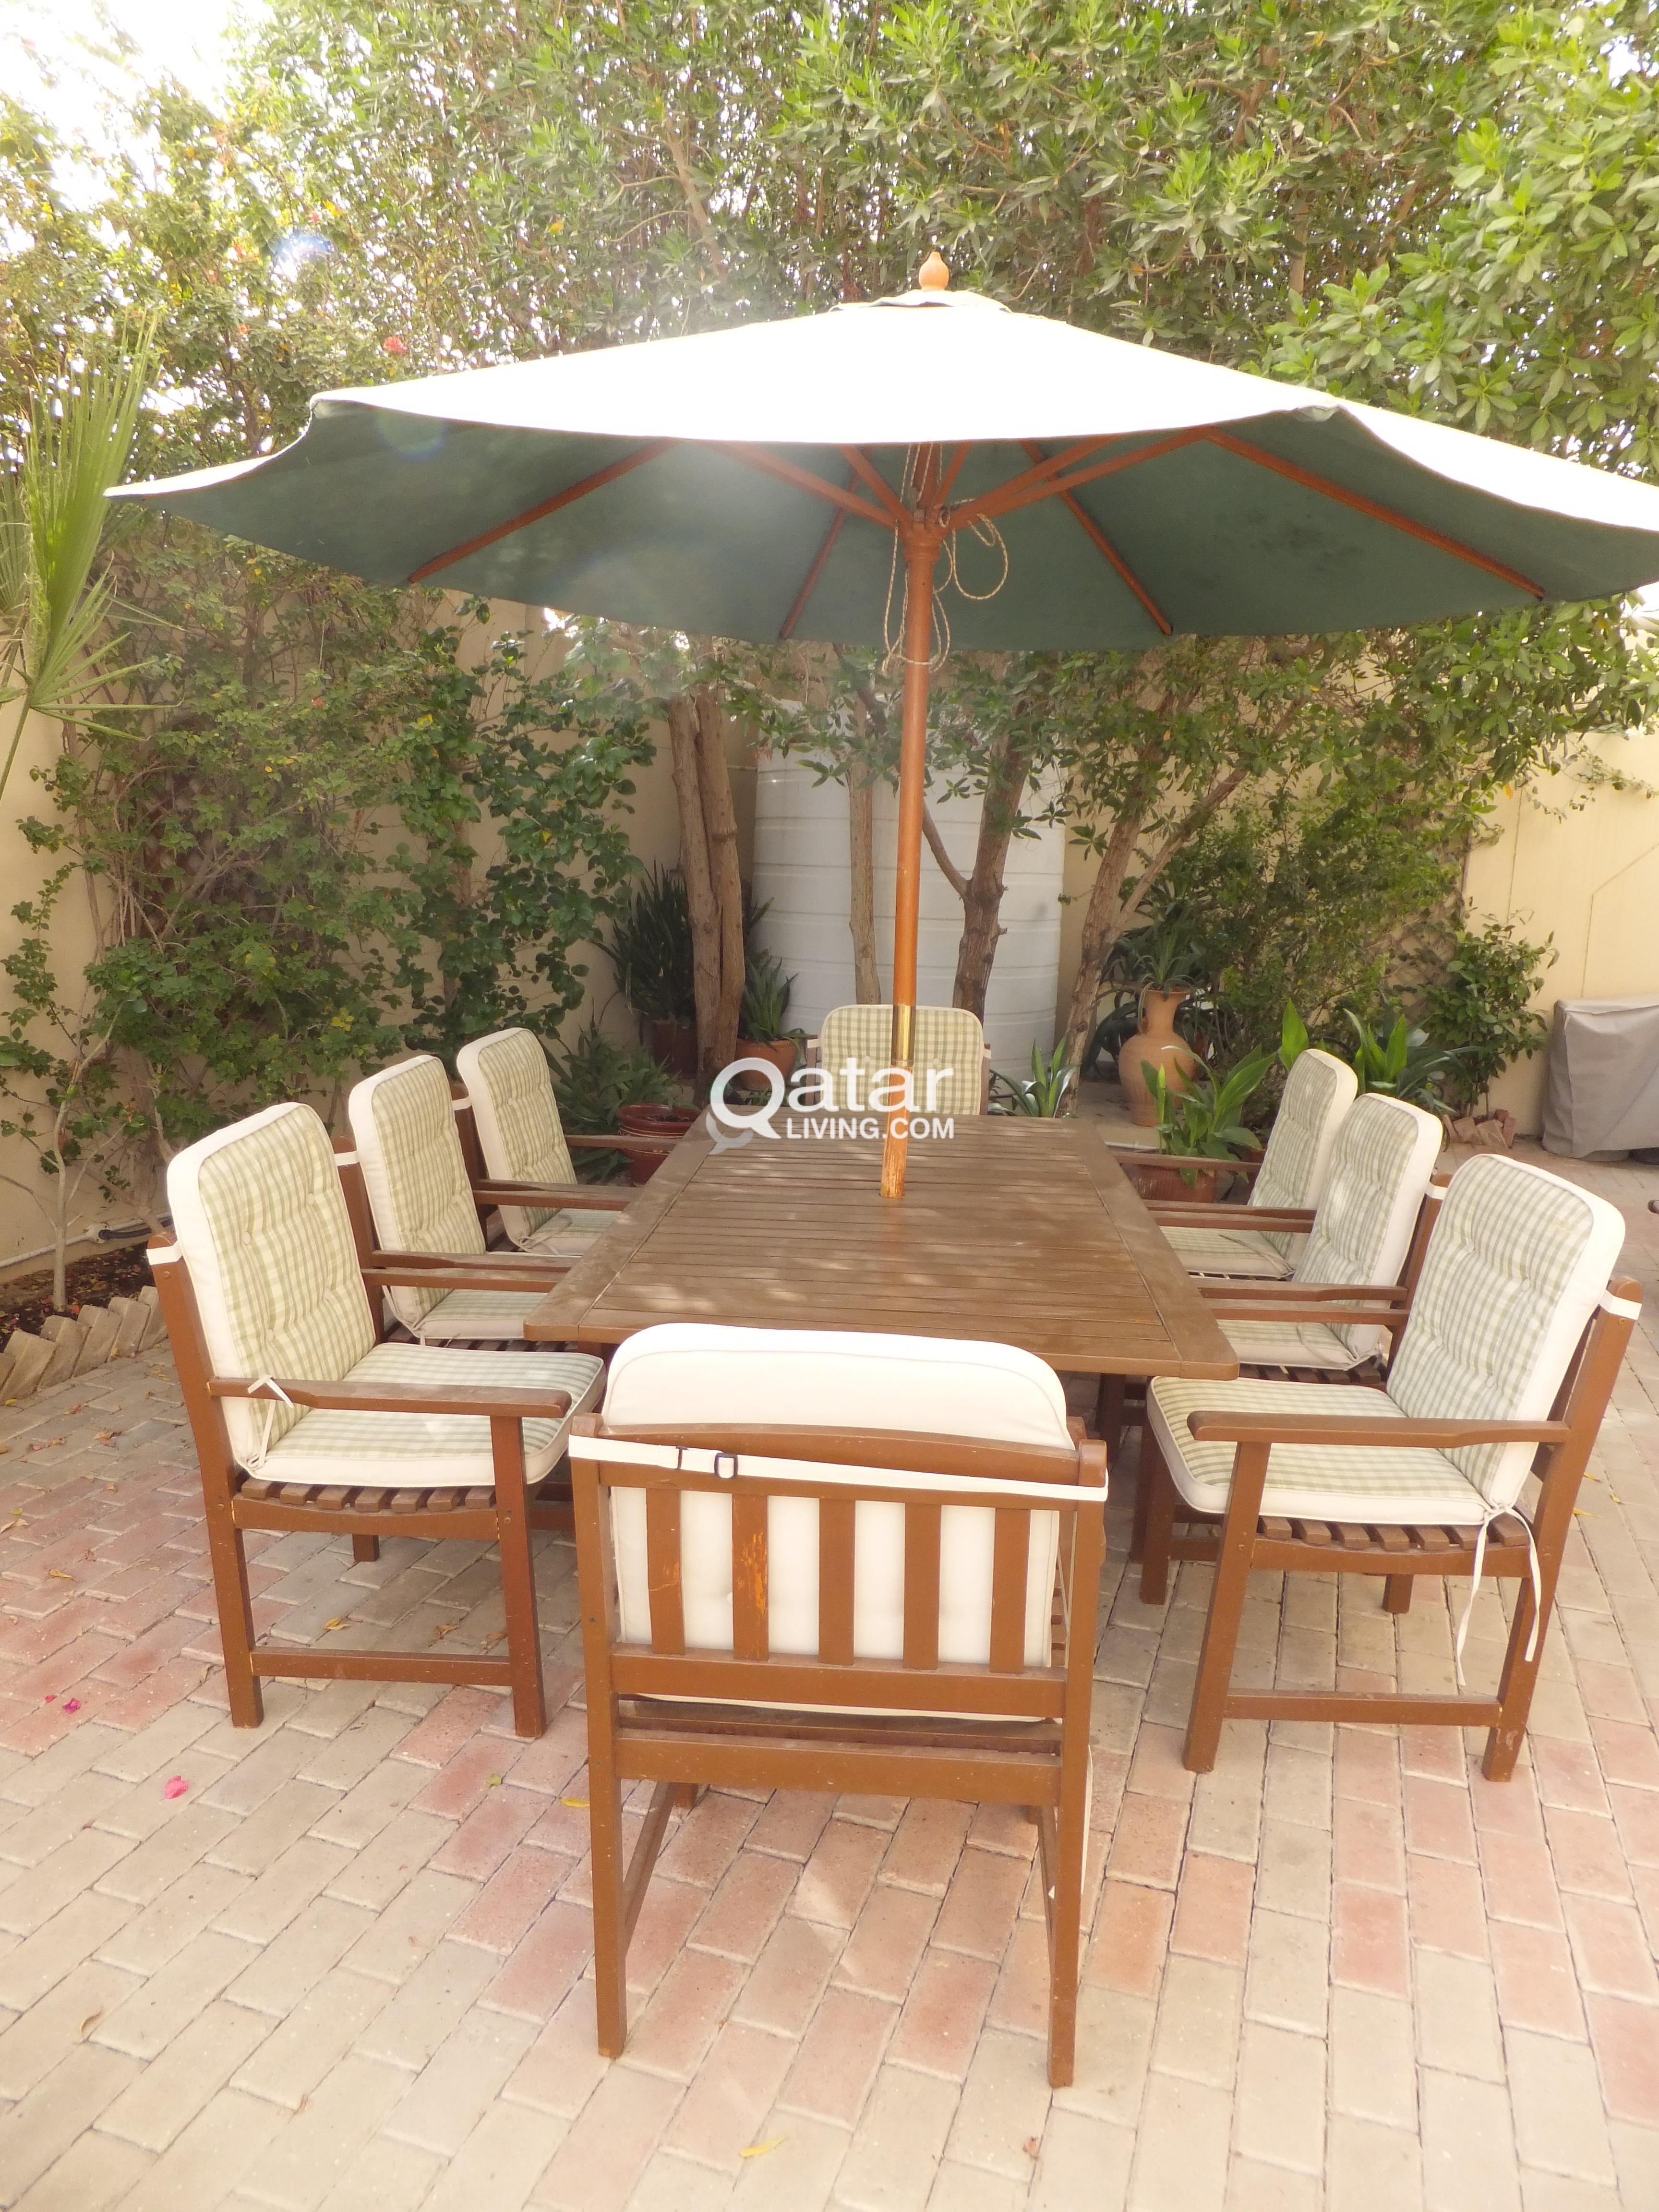 Marvelous Outdoor Furniture Qatar Gallery Simple Design